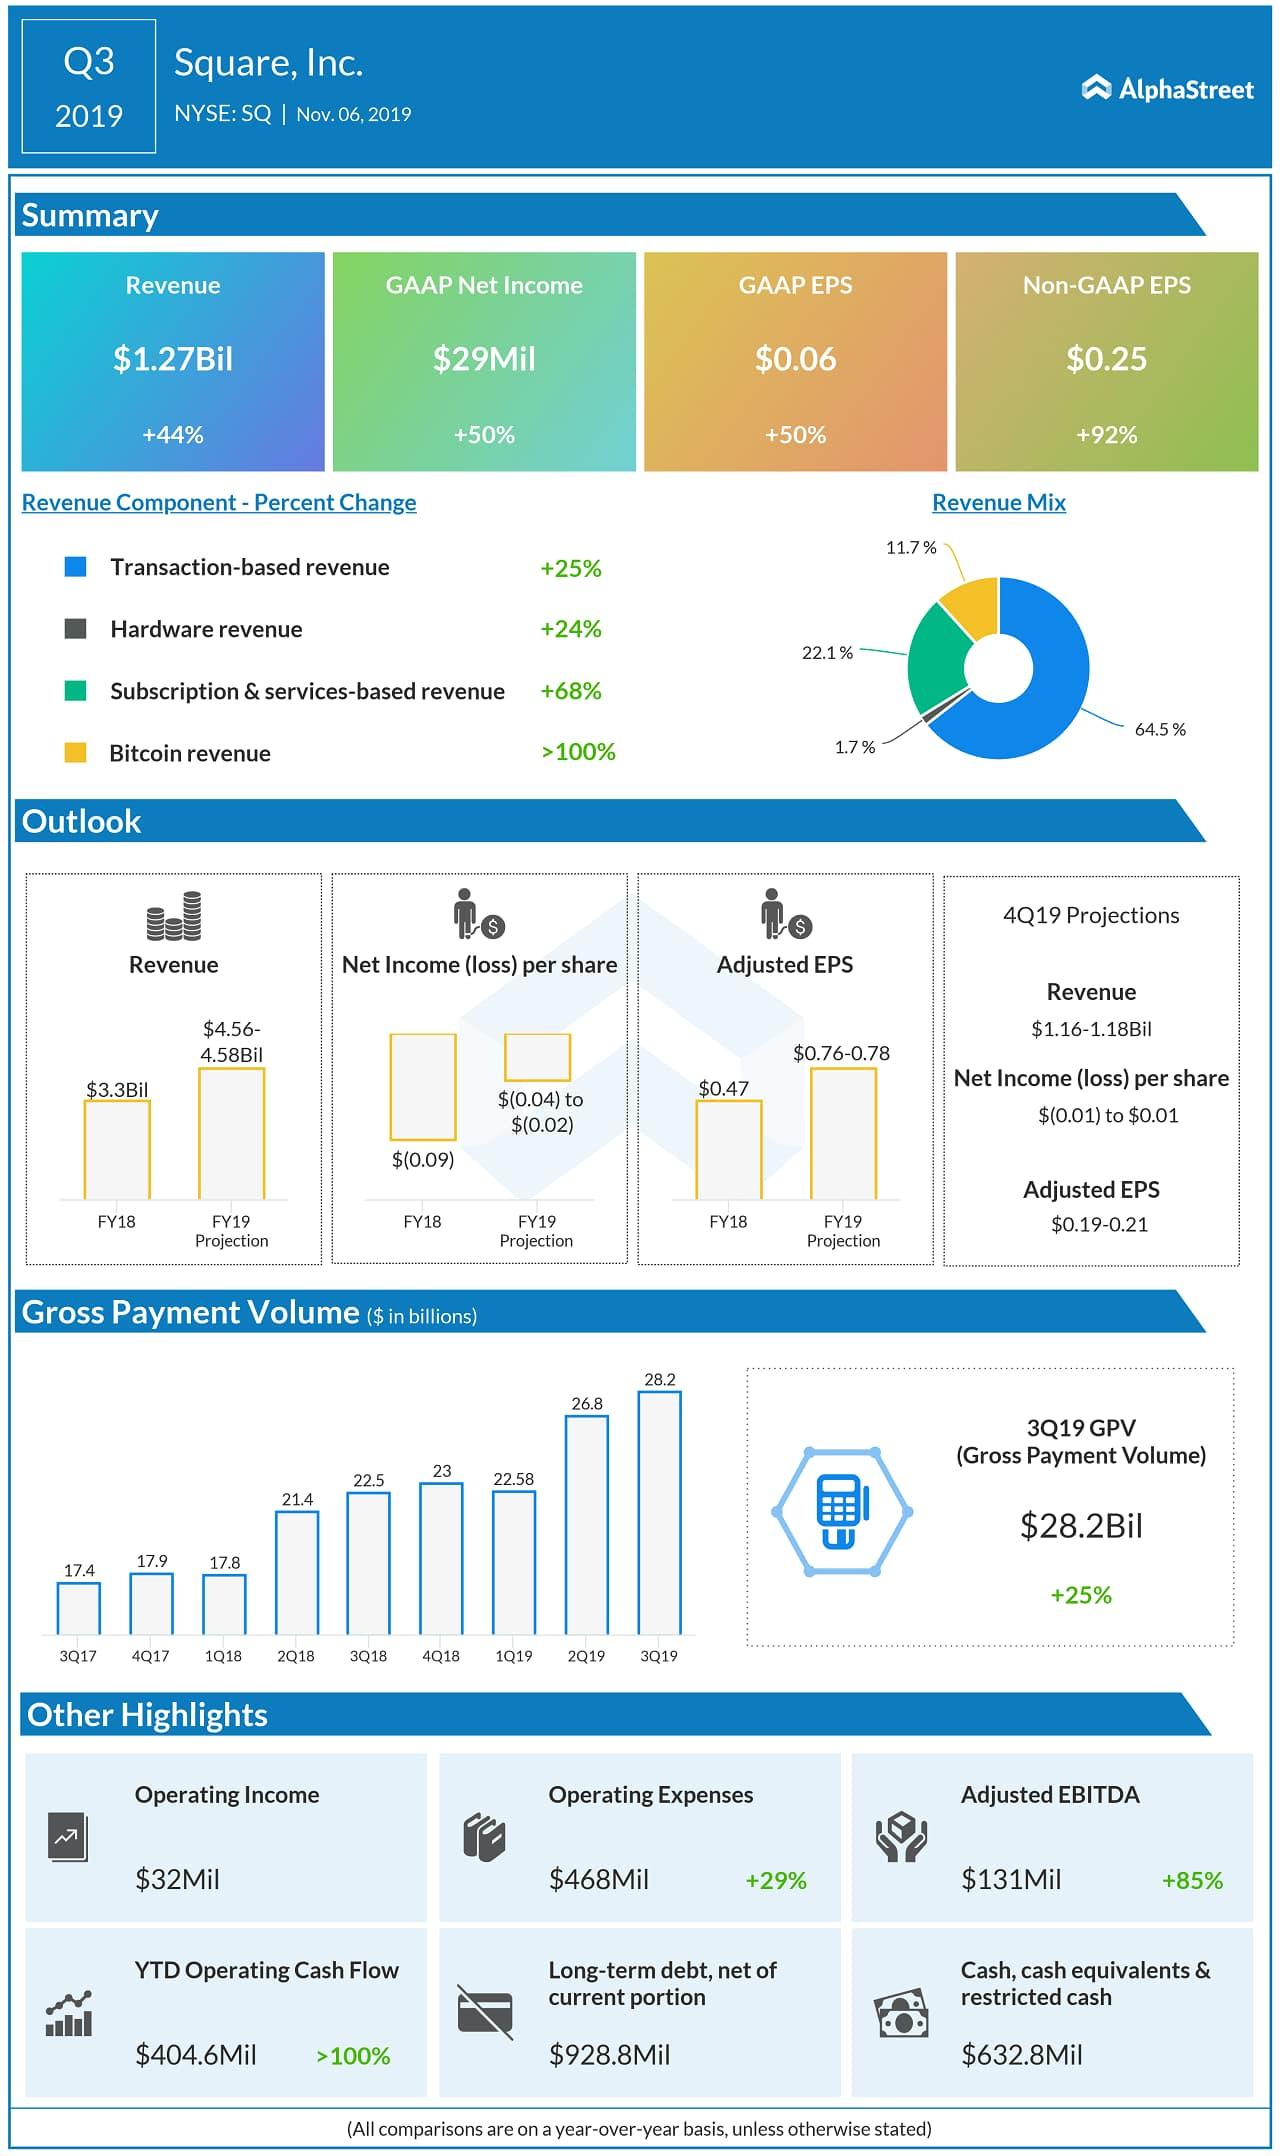 Square beats Q3 2019 revenue and earnings estimates